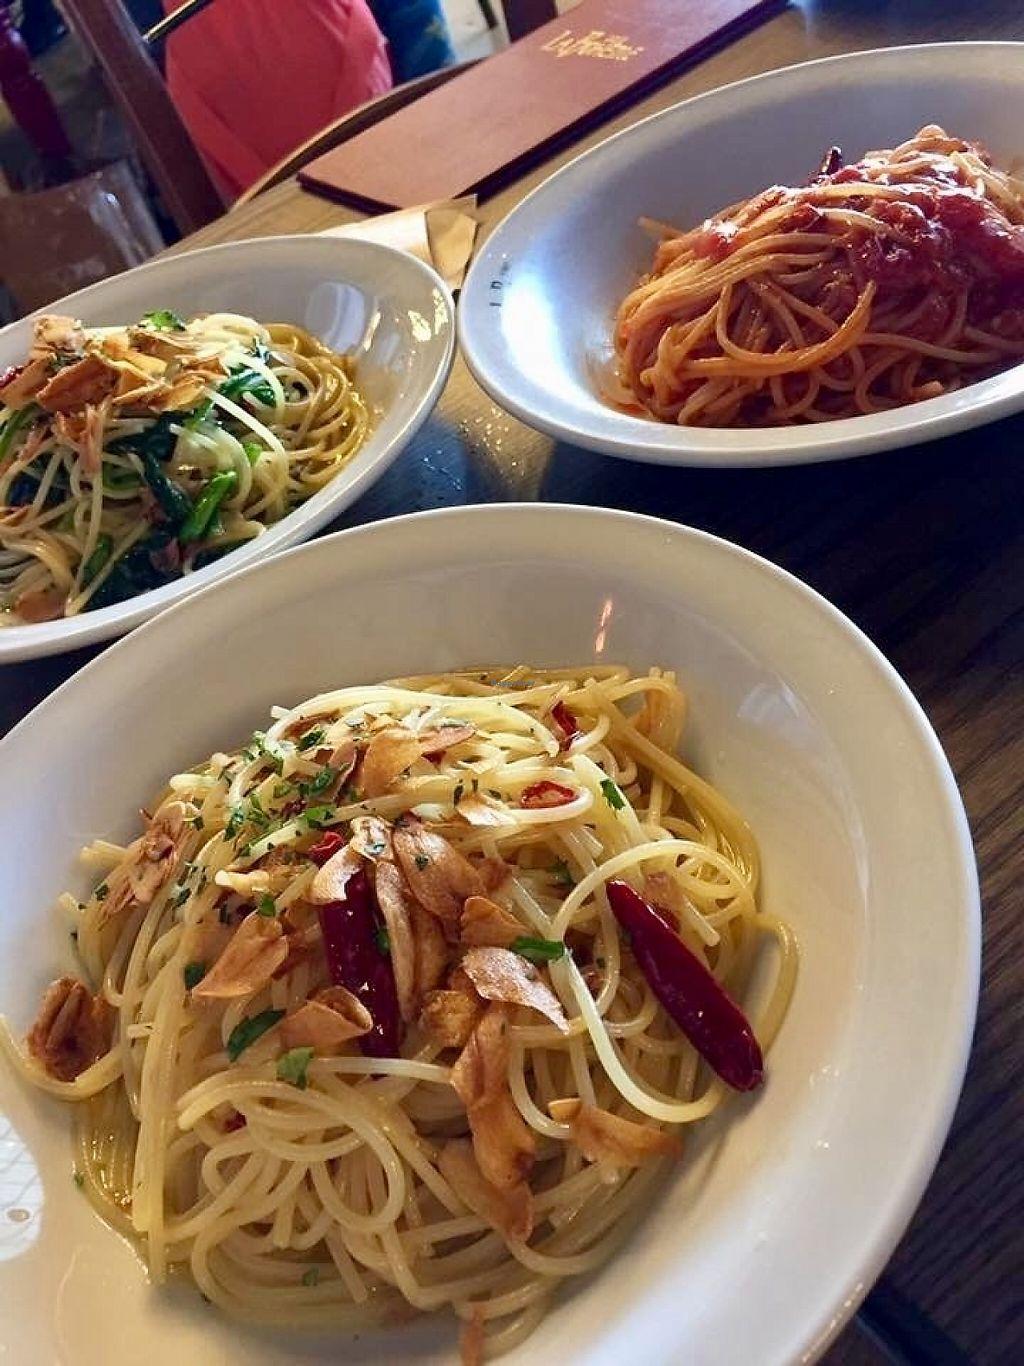 "Photo of Cafe La Boheme - Sakura-Shinmachi  by <a href=""/members/profile/paulkates"">paulkates</a> <br/>Vegan pasta <br/> June 7, 2017  - <a href='/contact/abuse/image/93491/266534'>Report</a>"